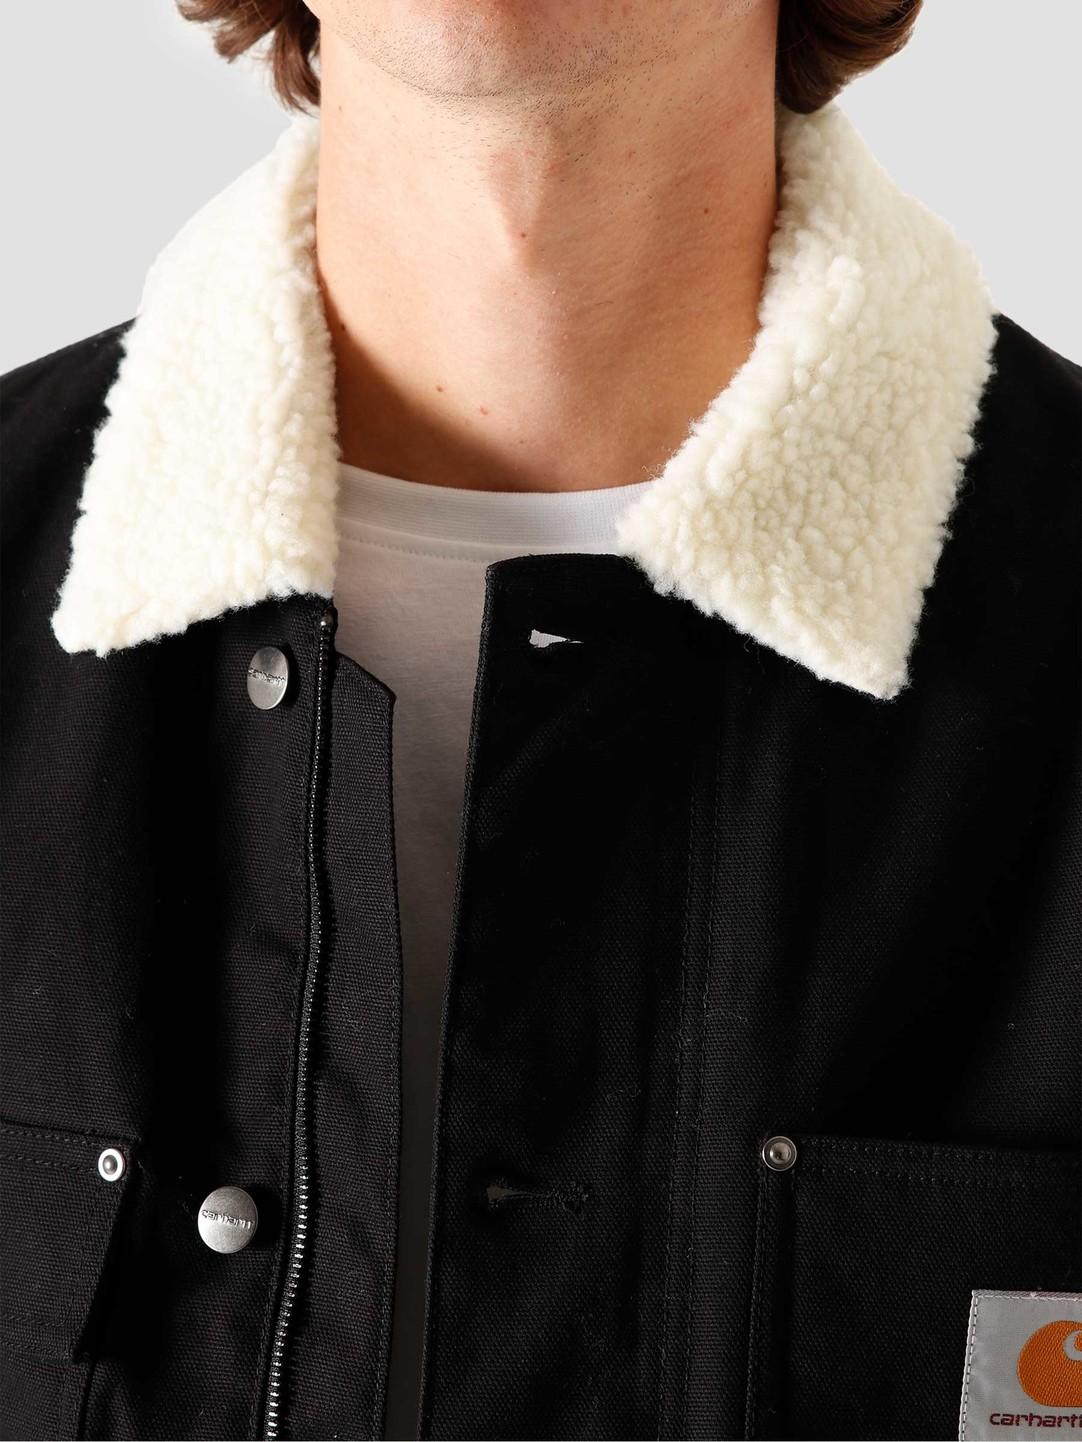 Carhartt WIP Carhartt WIP Fairmount Coat Black I028427-8901